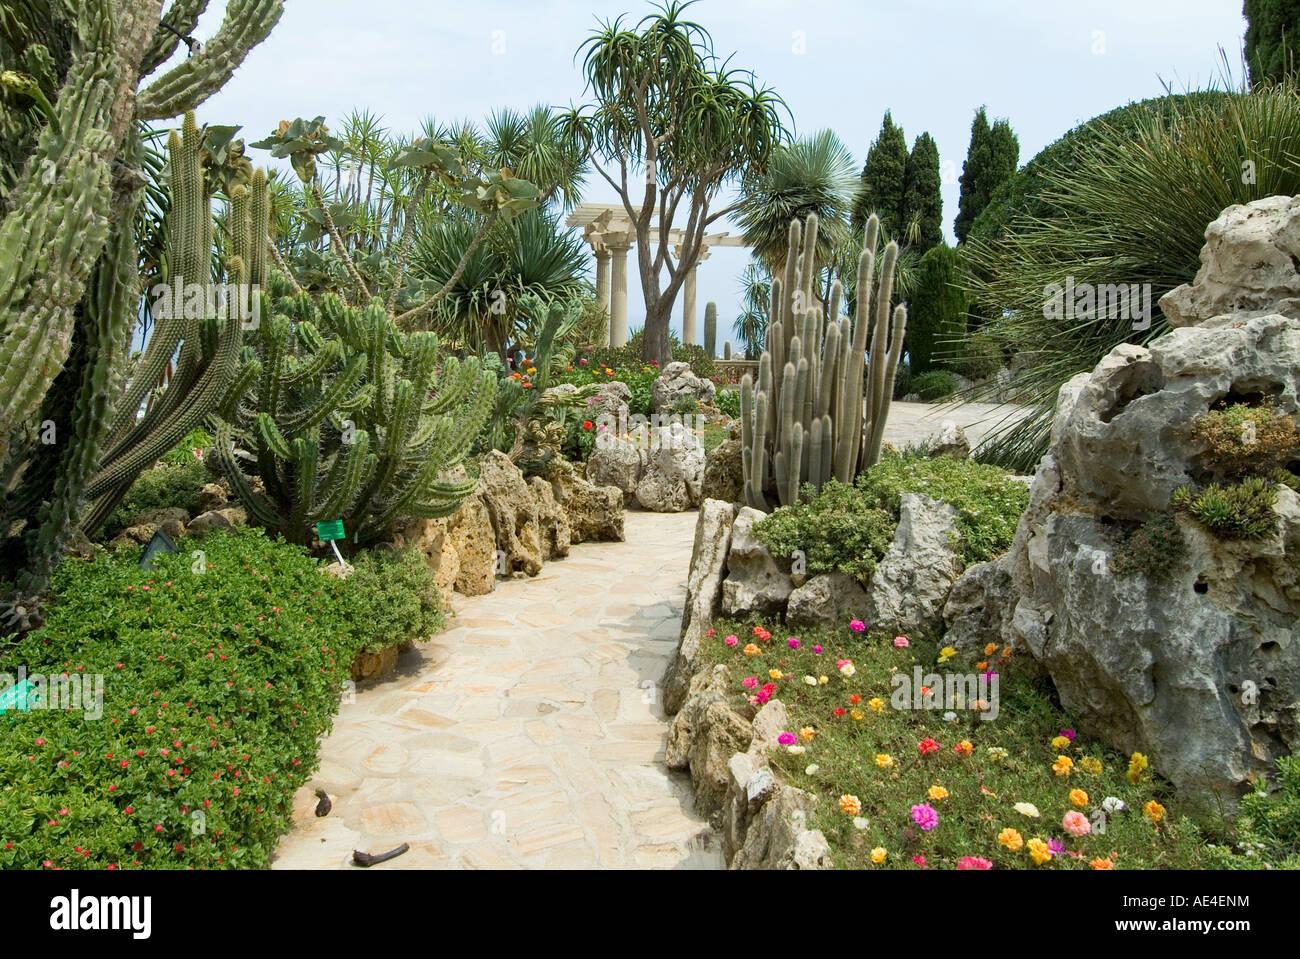 Jardin exotique moneghetti monaco europe stock photo 13565023 alamy - Photo de jardin exotique ...